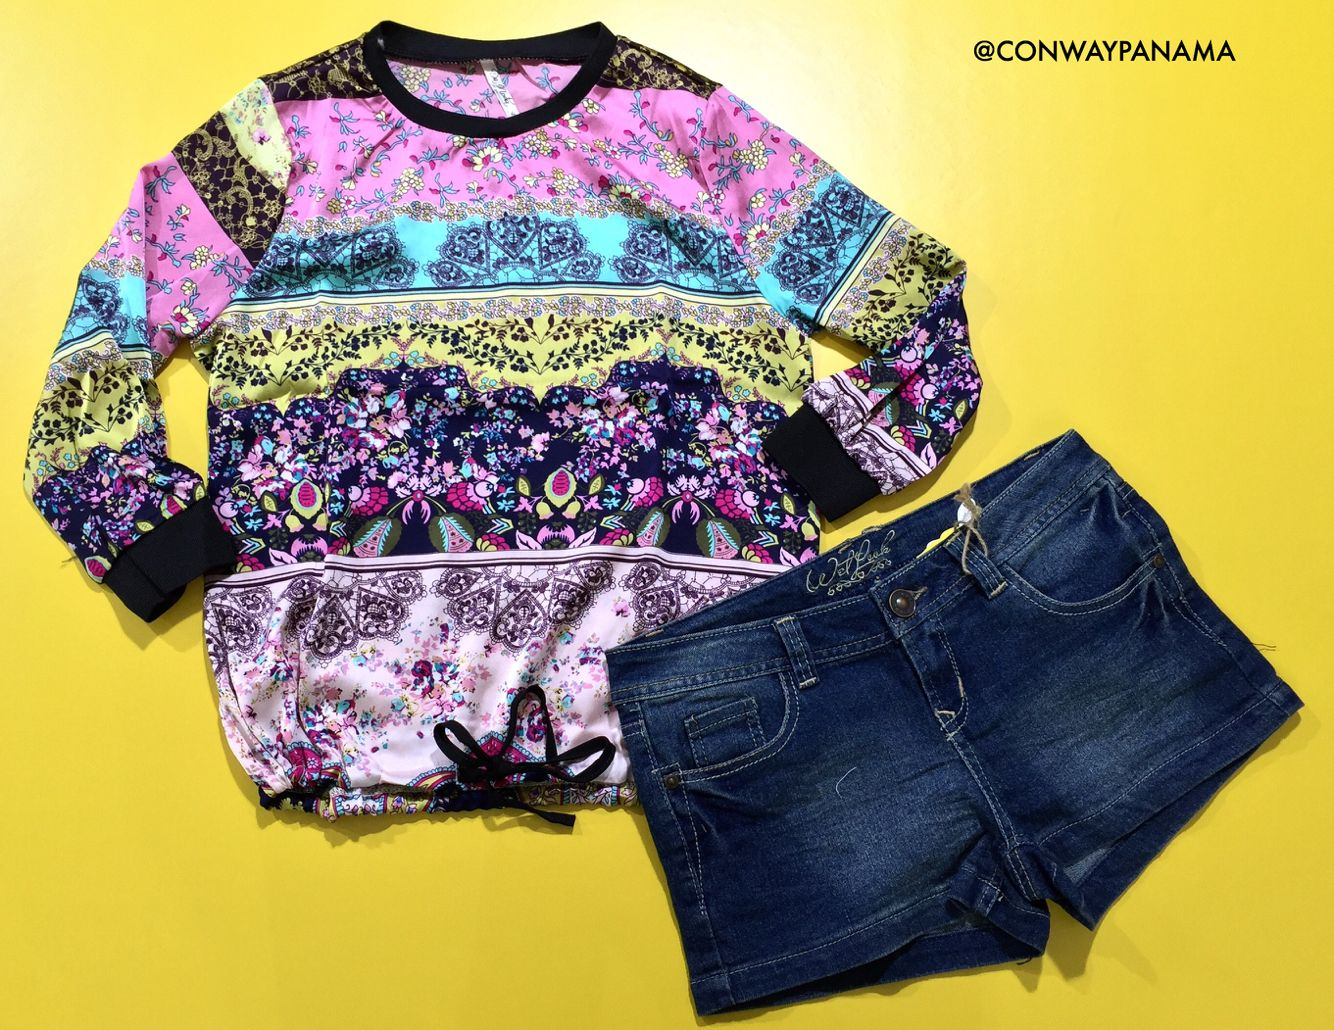 #Fashion #FashionPanama #Panama #ModaPanama #Moda #ConwayModa #AsíEsConway #ILikeIt